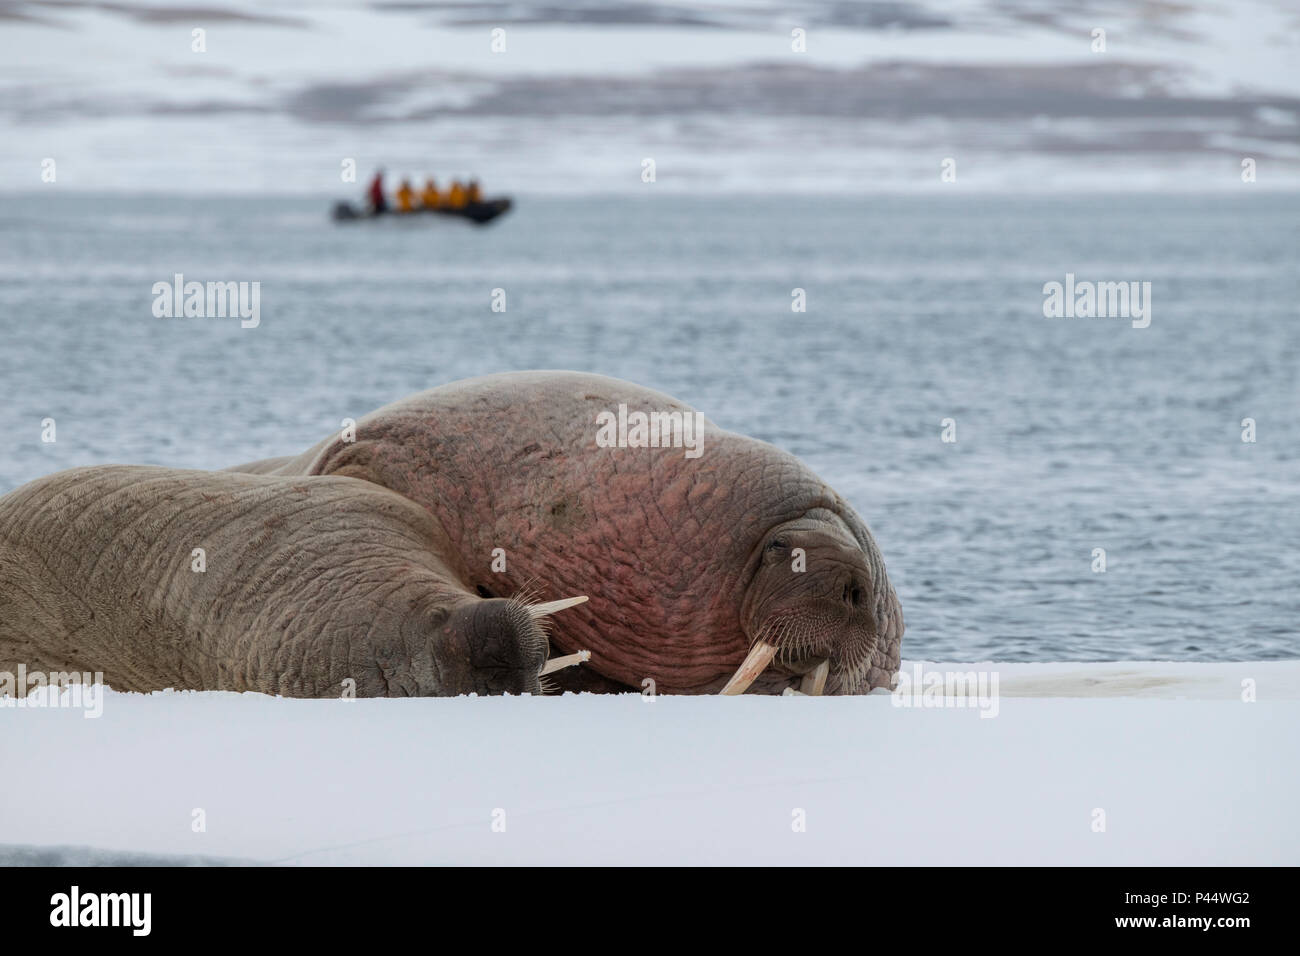 Noruega, Svalbard, Nordaustlandet, Austfonna. La morsa (Odobenus rosmarus) sobre el hielo. Adventure Travel zodiac en la distancia. Imagen De Stock